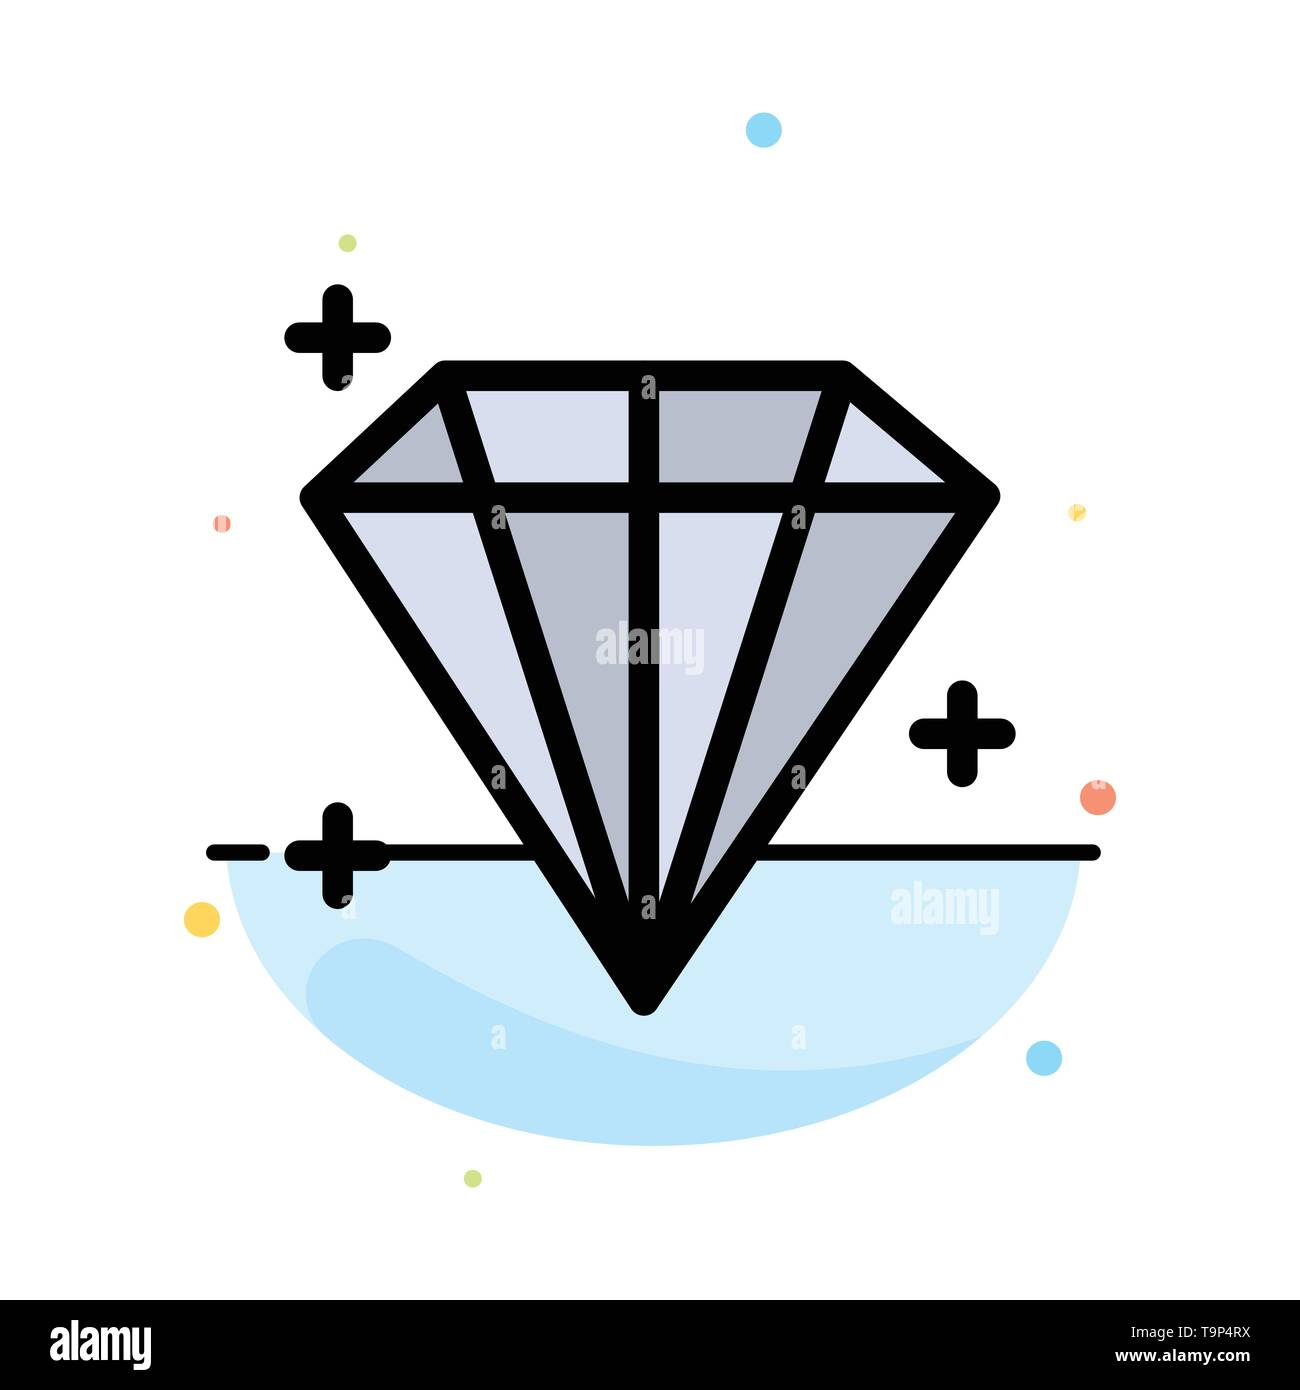 Diamond, Jewel, User Abstract Flat Color Icon Template - Stock Image